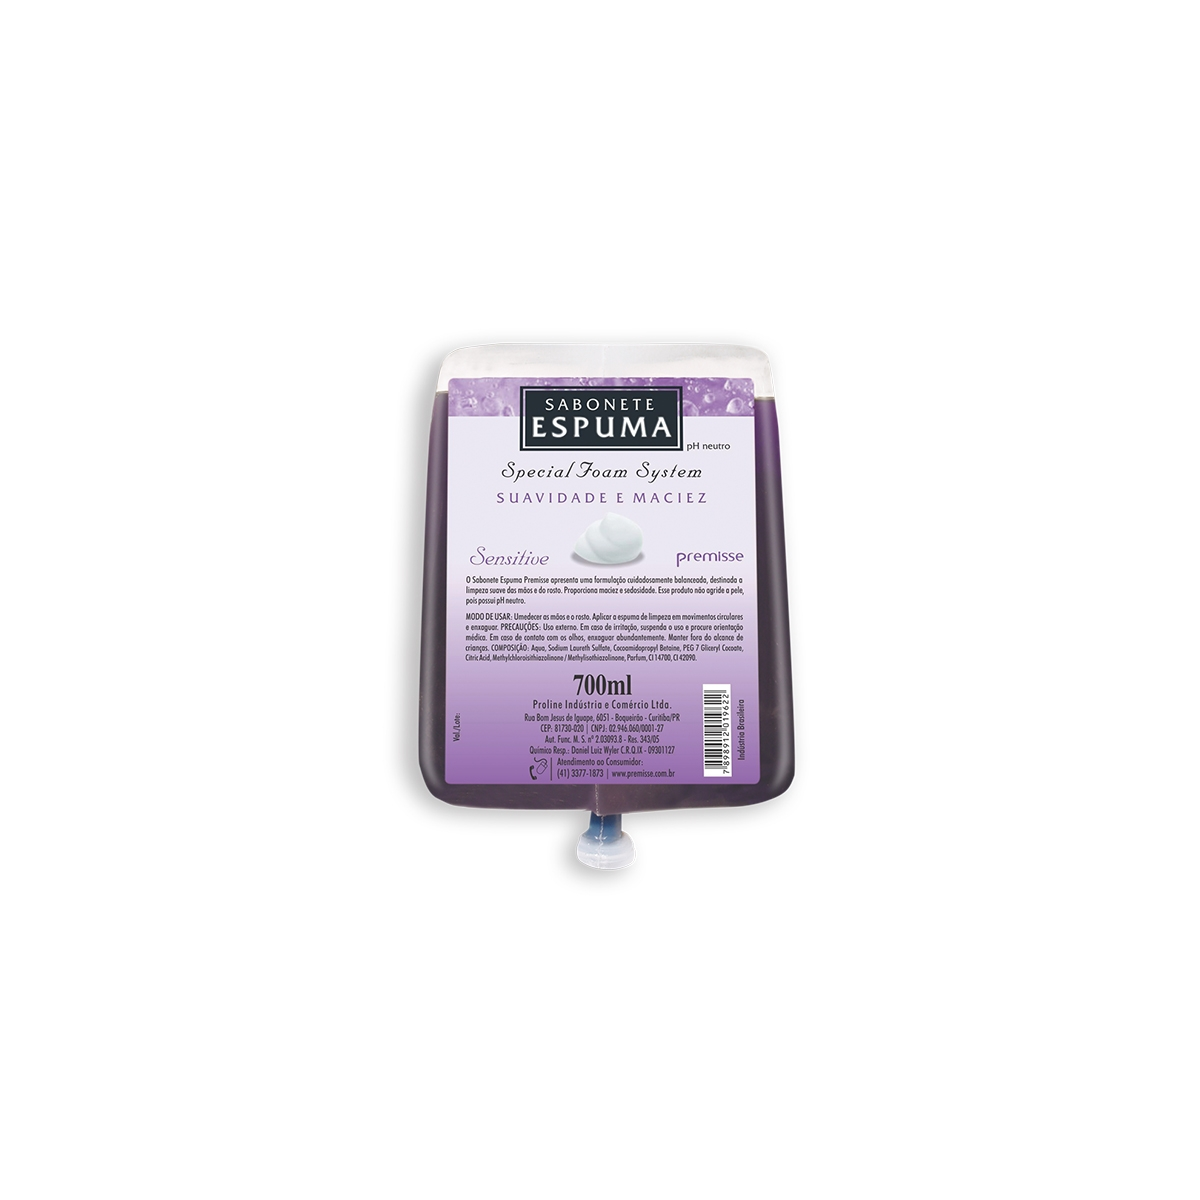 CÓD. 10202 - Sabonete Espuma Sensitive - 700 ML